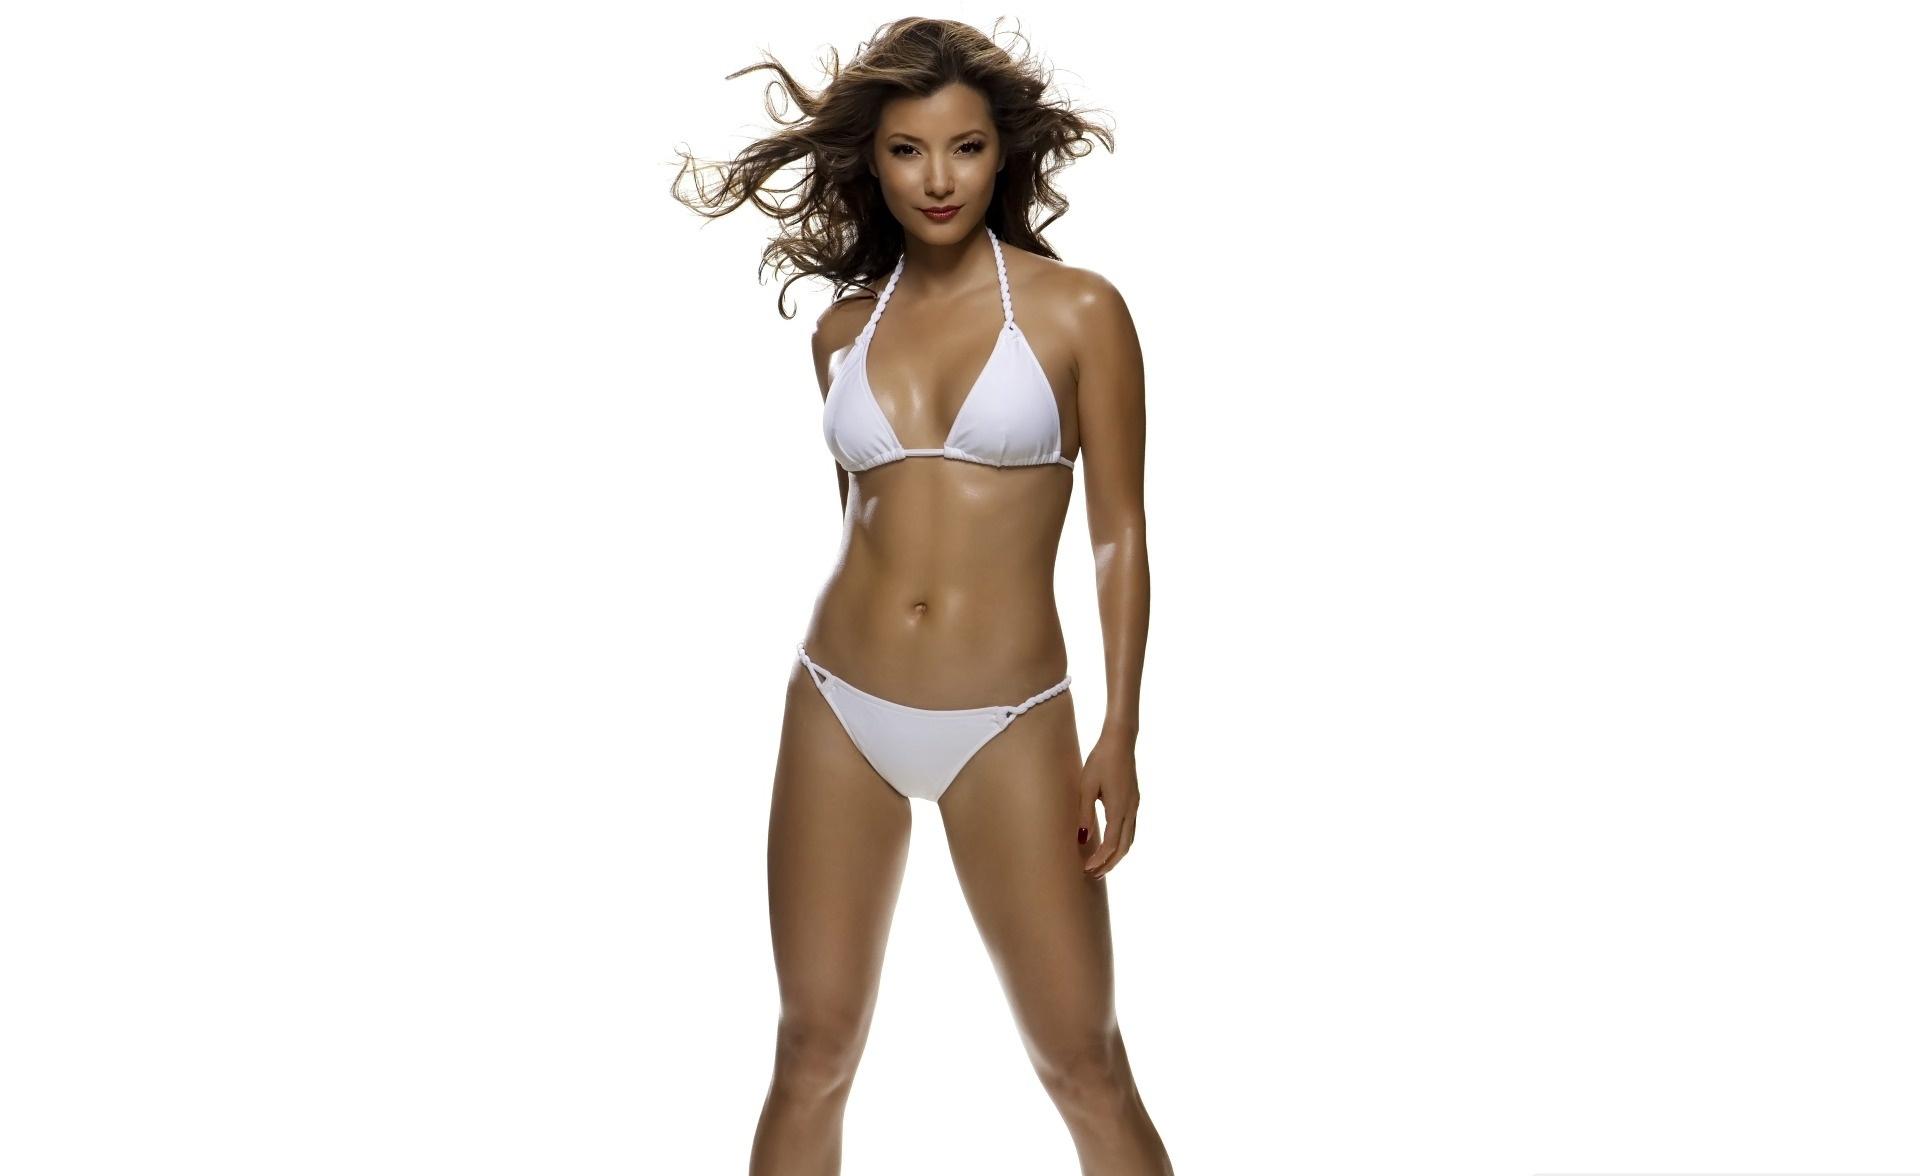 Bikini Kelly Hu naked (85 foto and video), Ass, Cleavage, Boobs, braless 2006